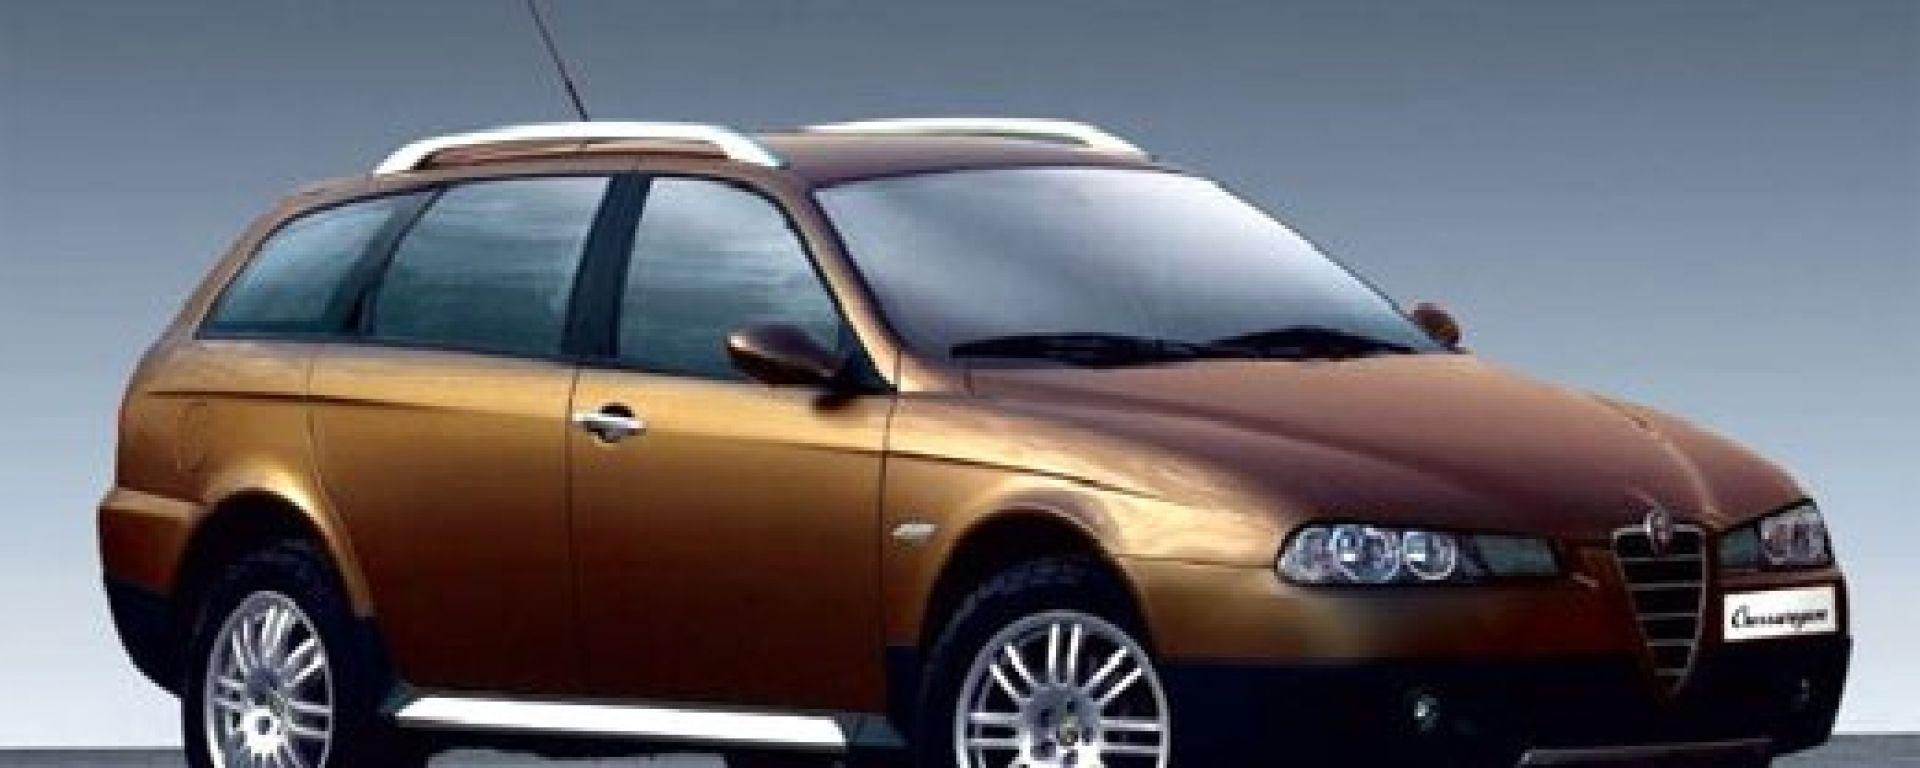 Anteprima: Alfa Romeo Crosswagon